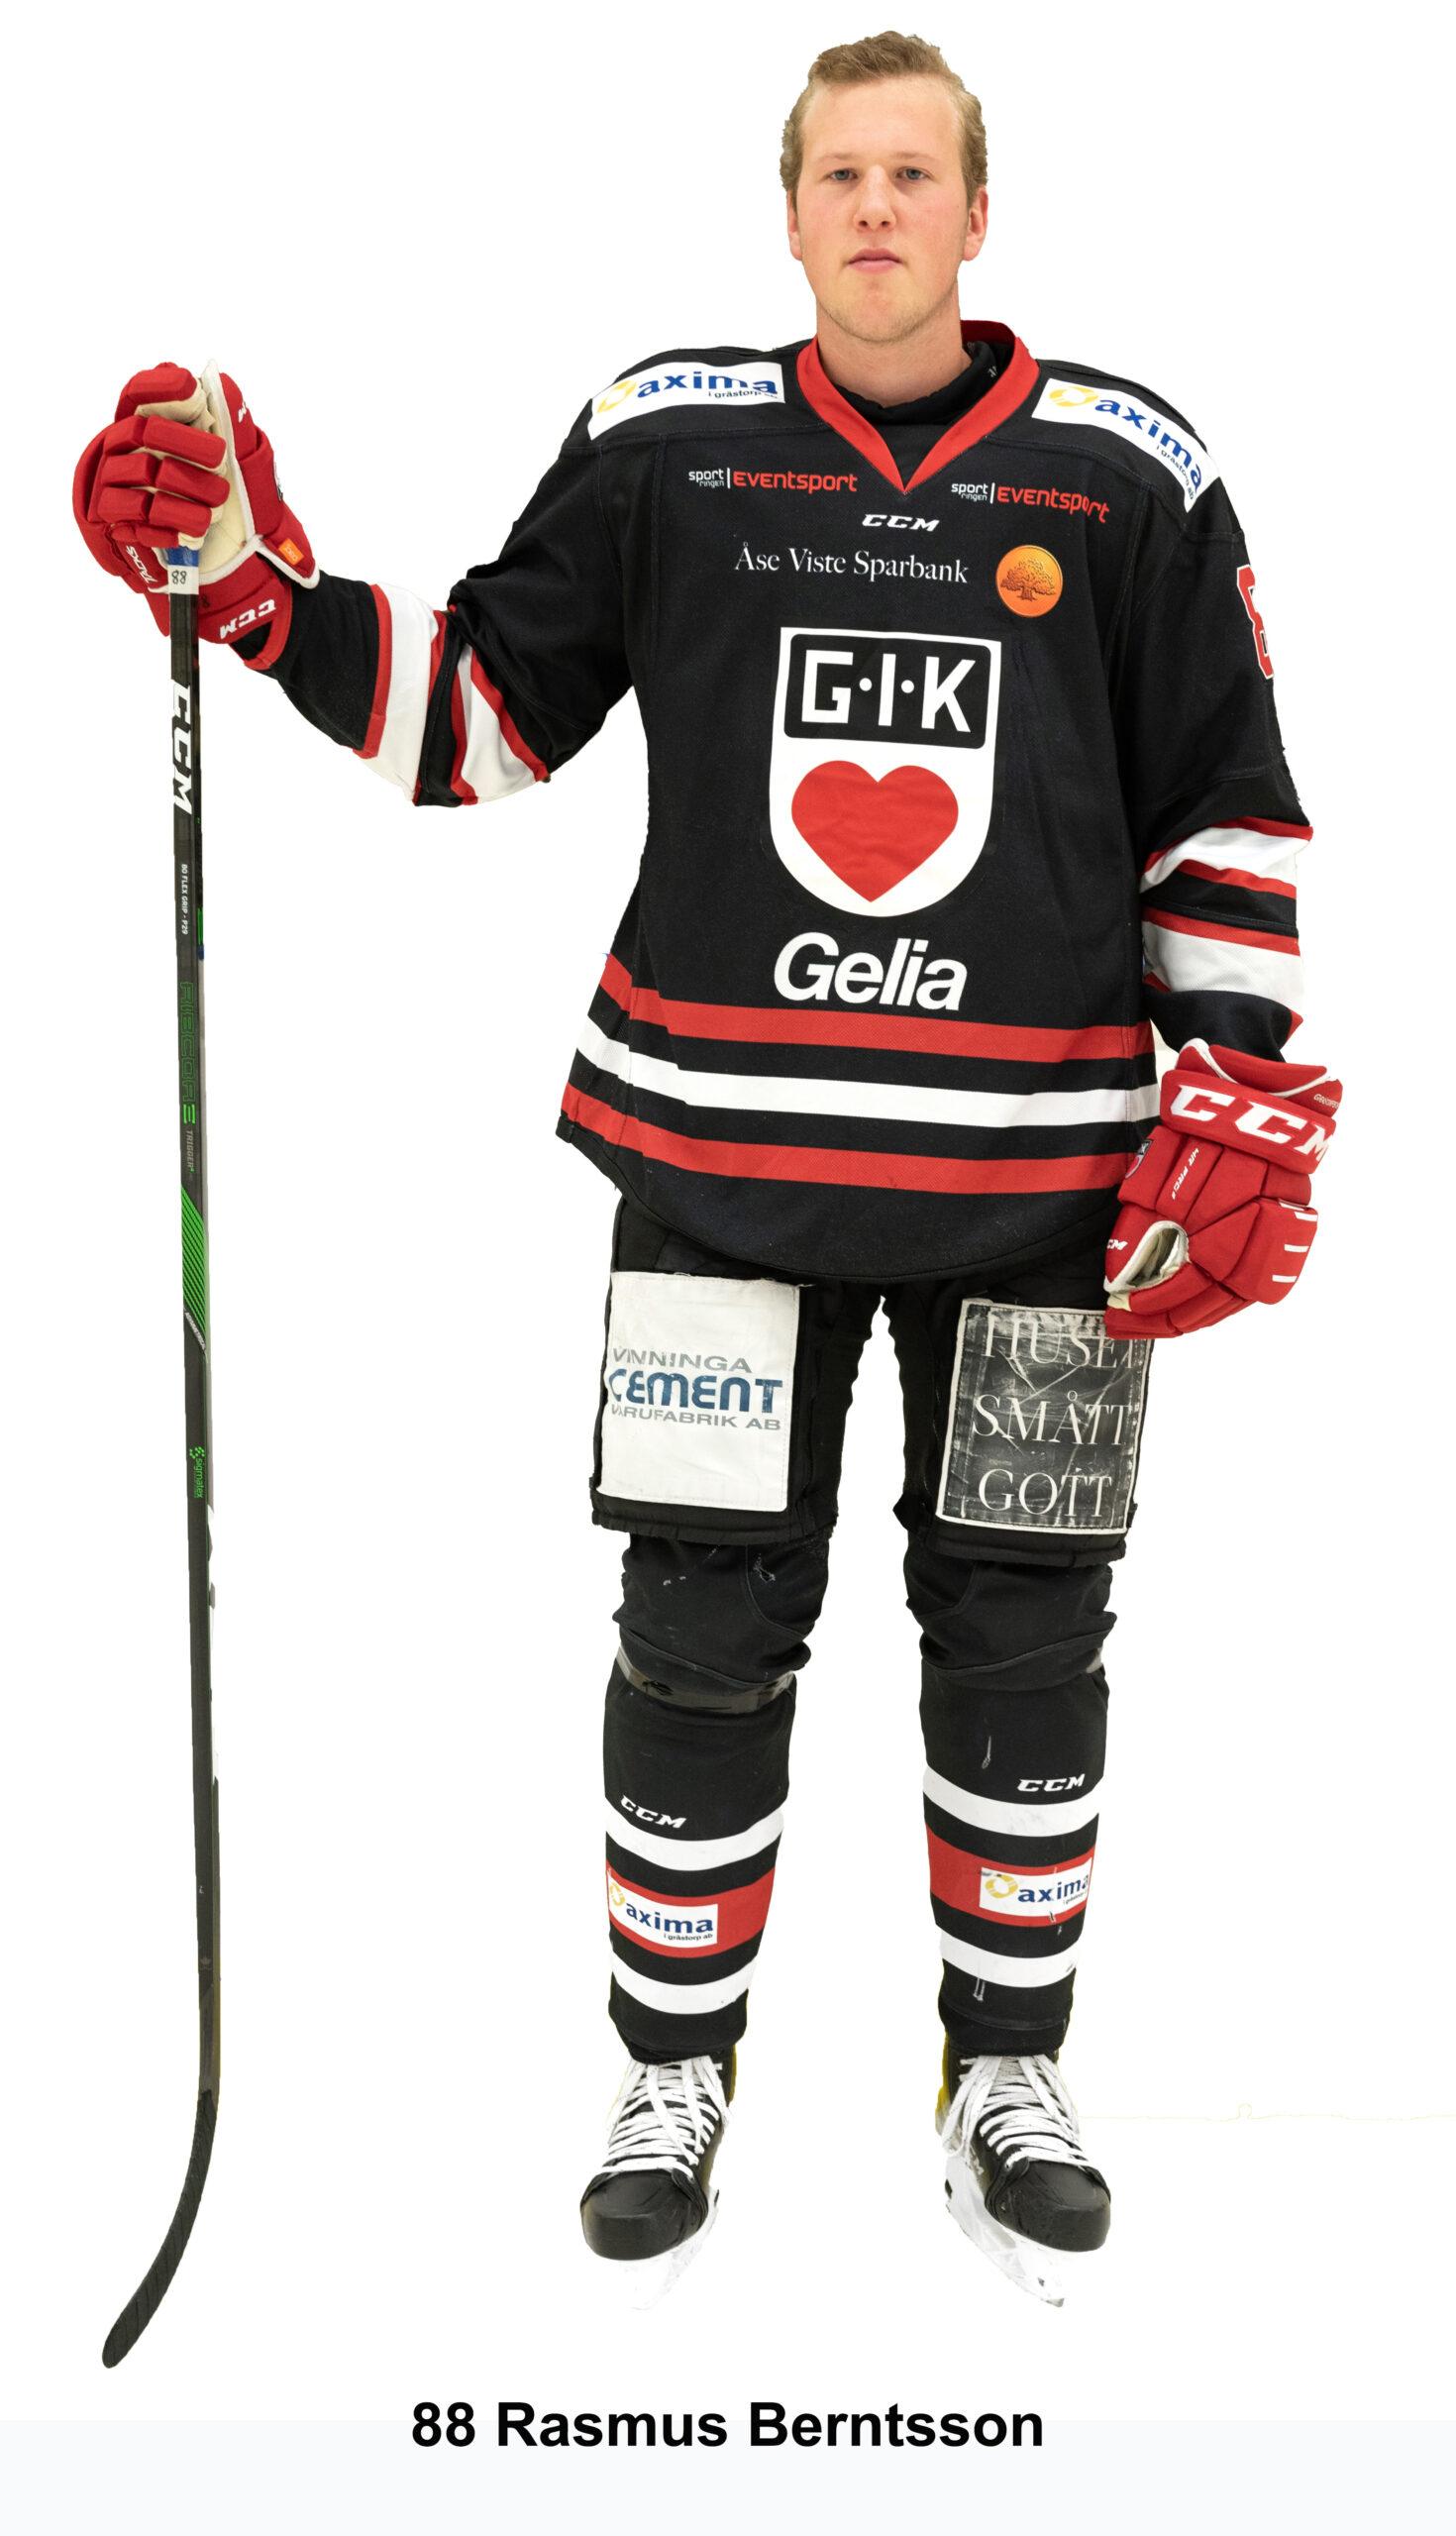 Rasmus Berntsson